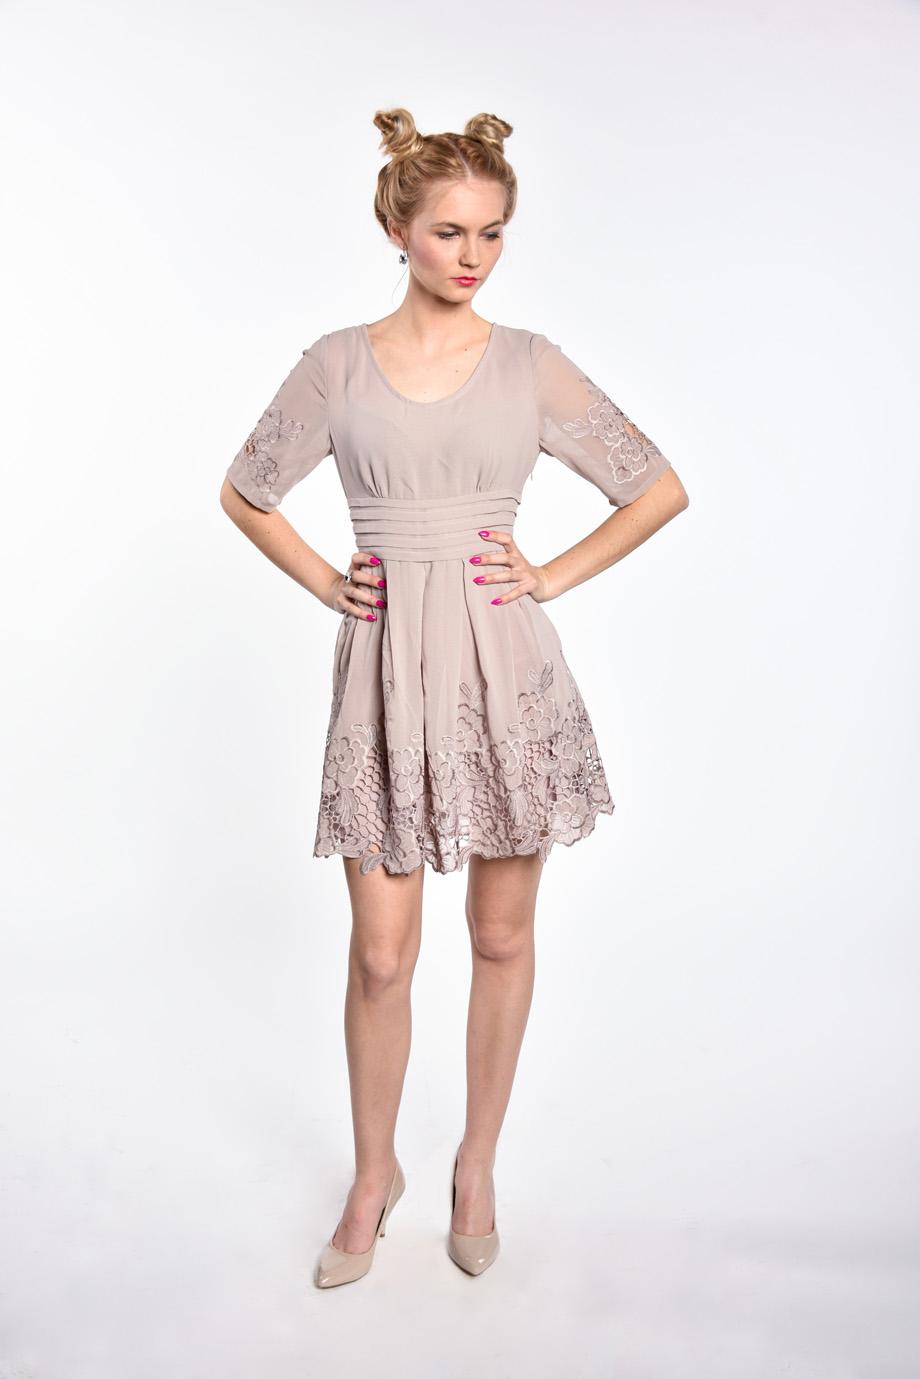 b6406c7ff86d obrázok 4 Chicwish sivé šaty s rukávom